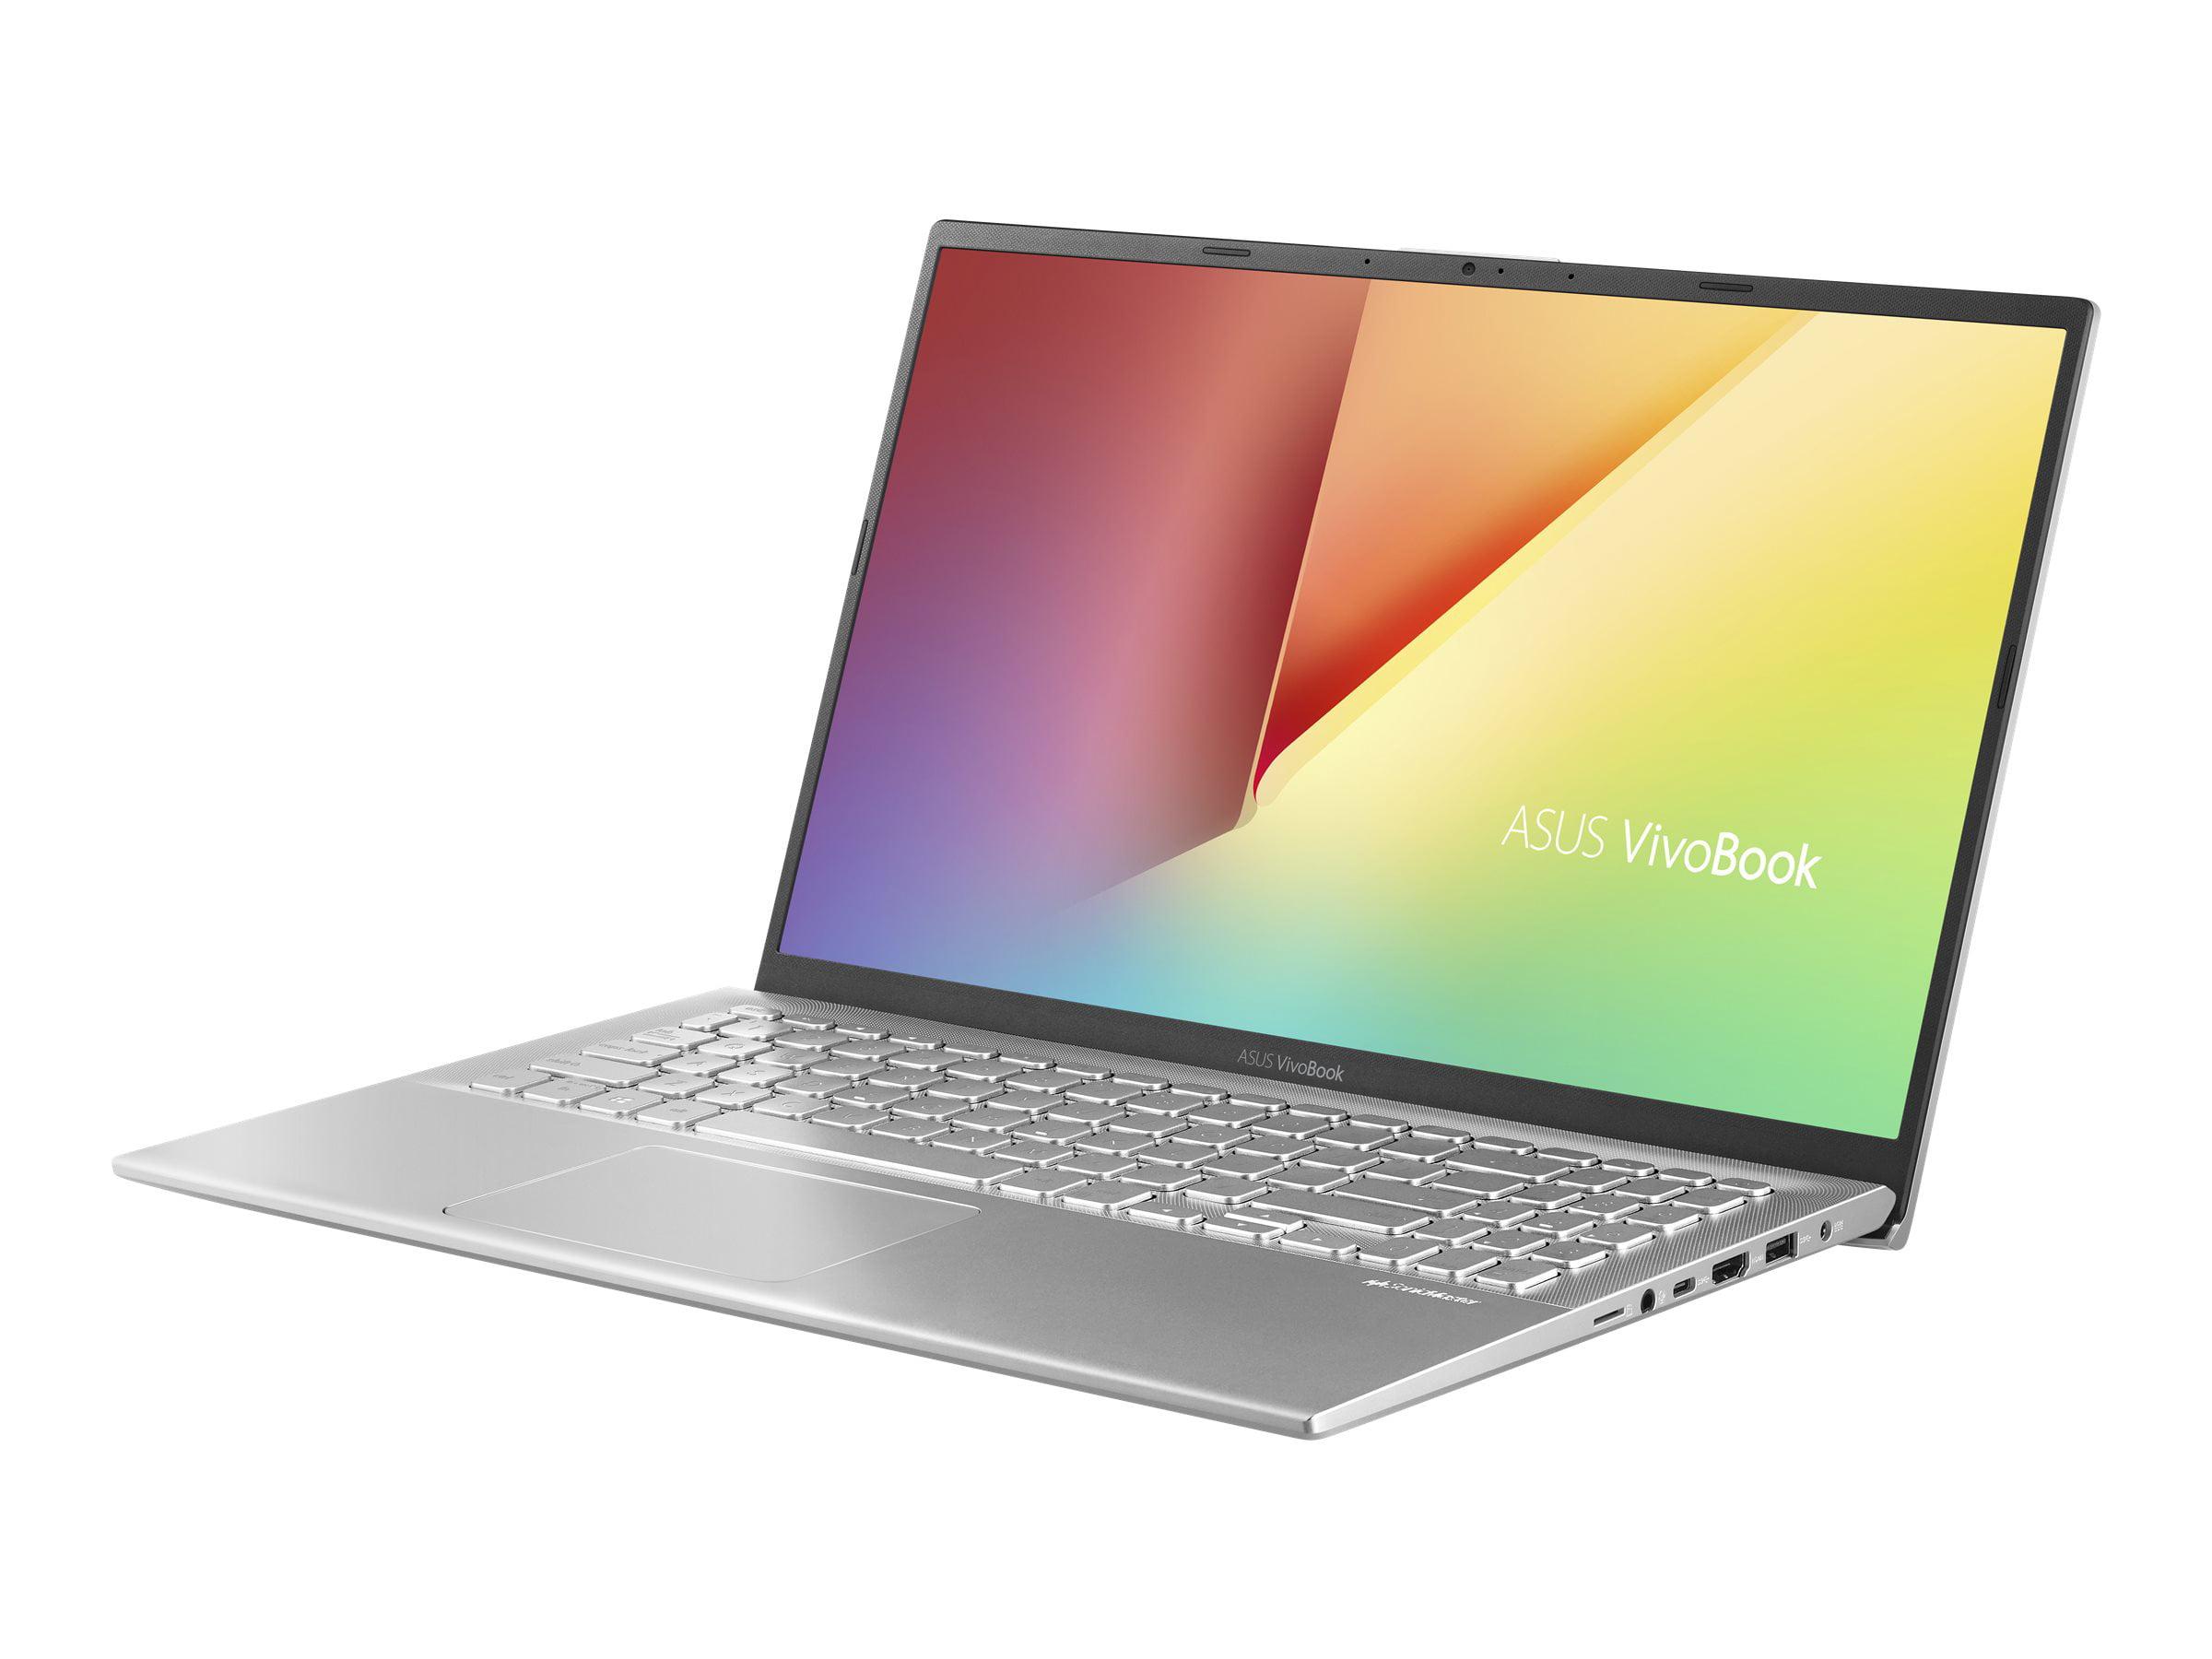 Asus Vivobook 15 15 6 1920x1080 Laptop Amd Ryzen 7 12gb Memory Amd Radeon Rx Vega 10 512gb Ssd Transparent Silver Walmart Com Walmart Com